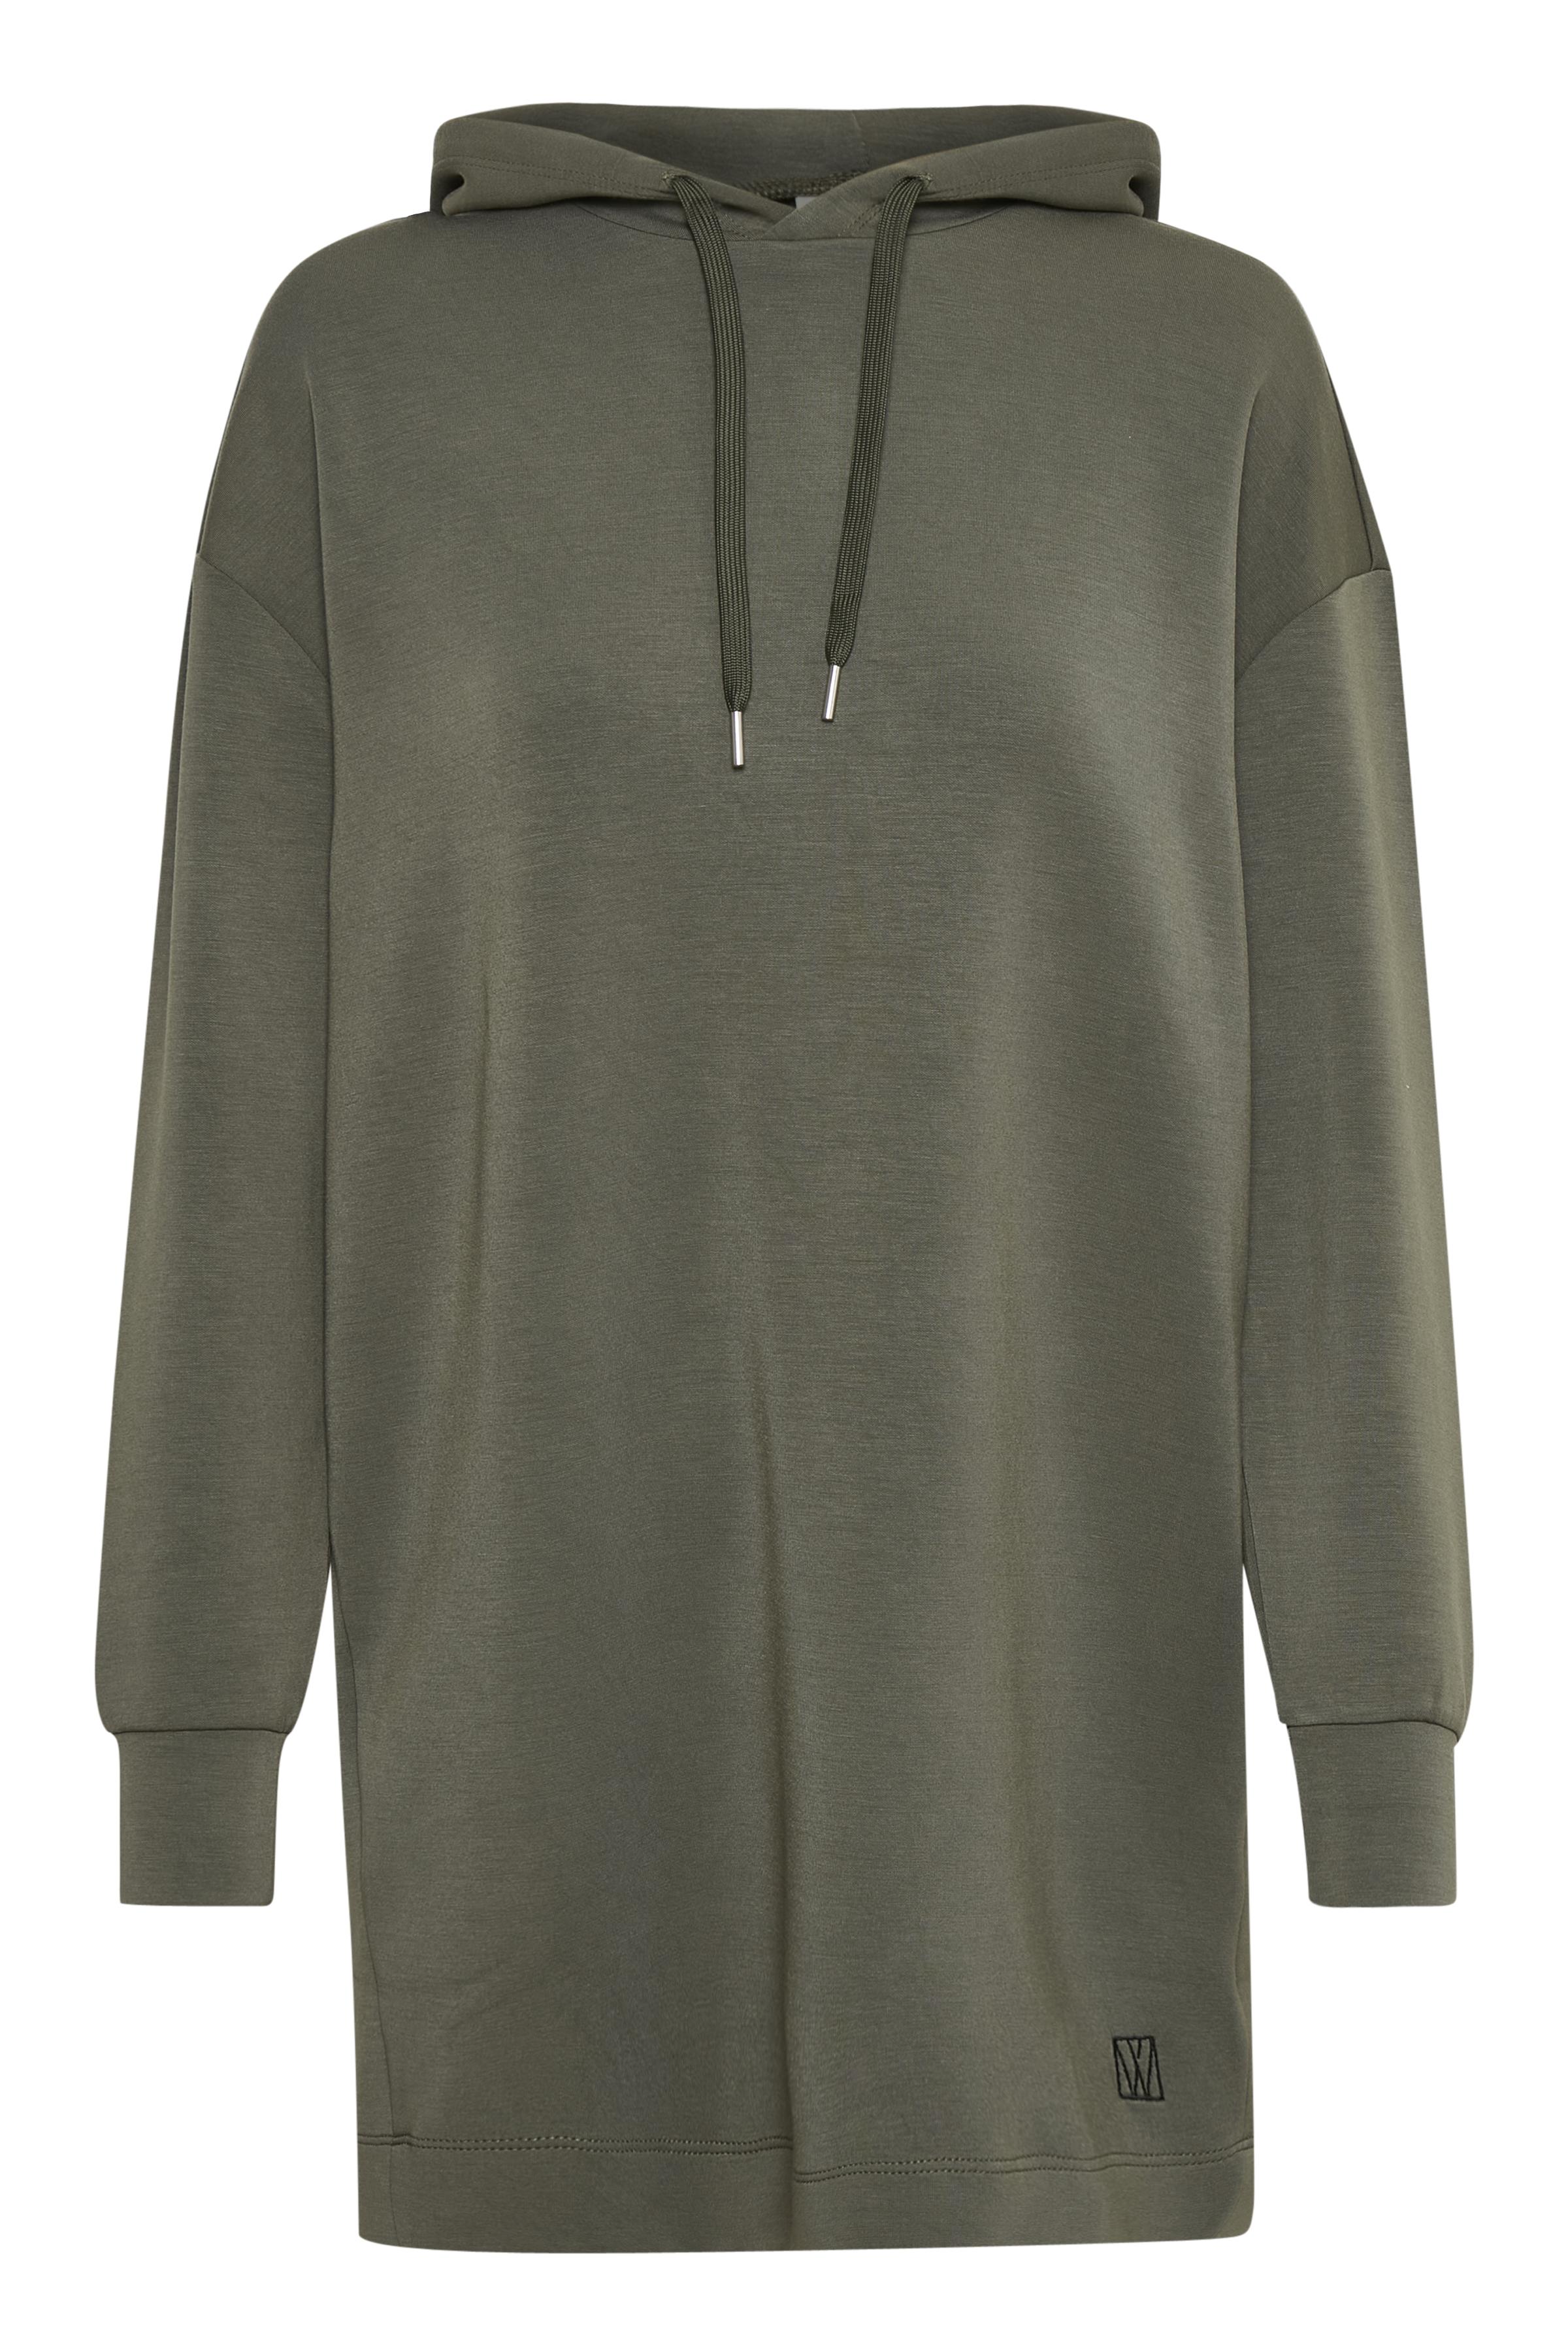 Inwear Daltoniw hoodie